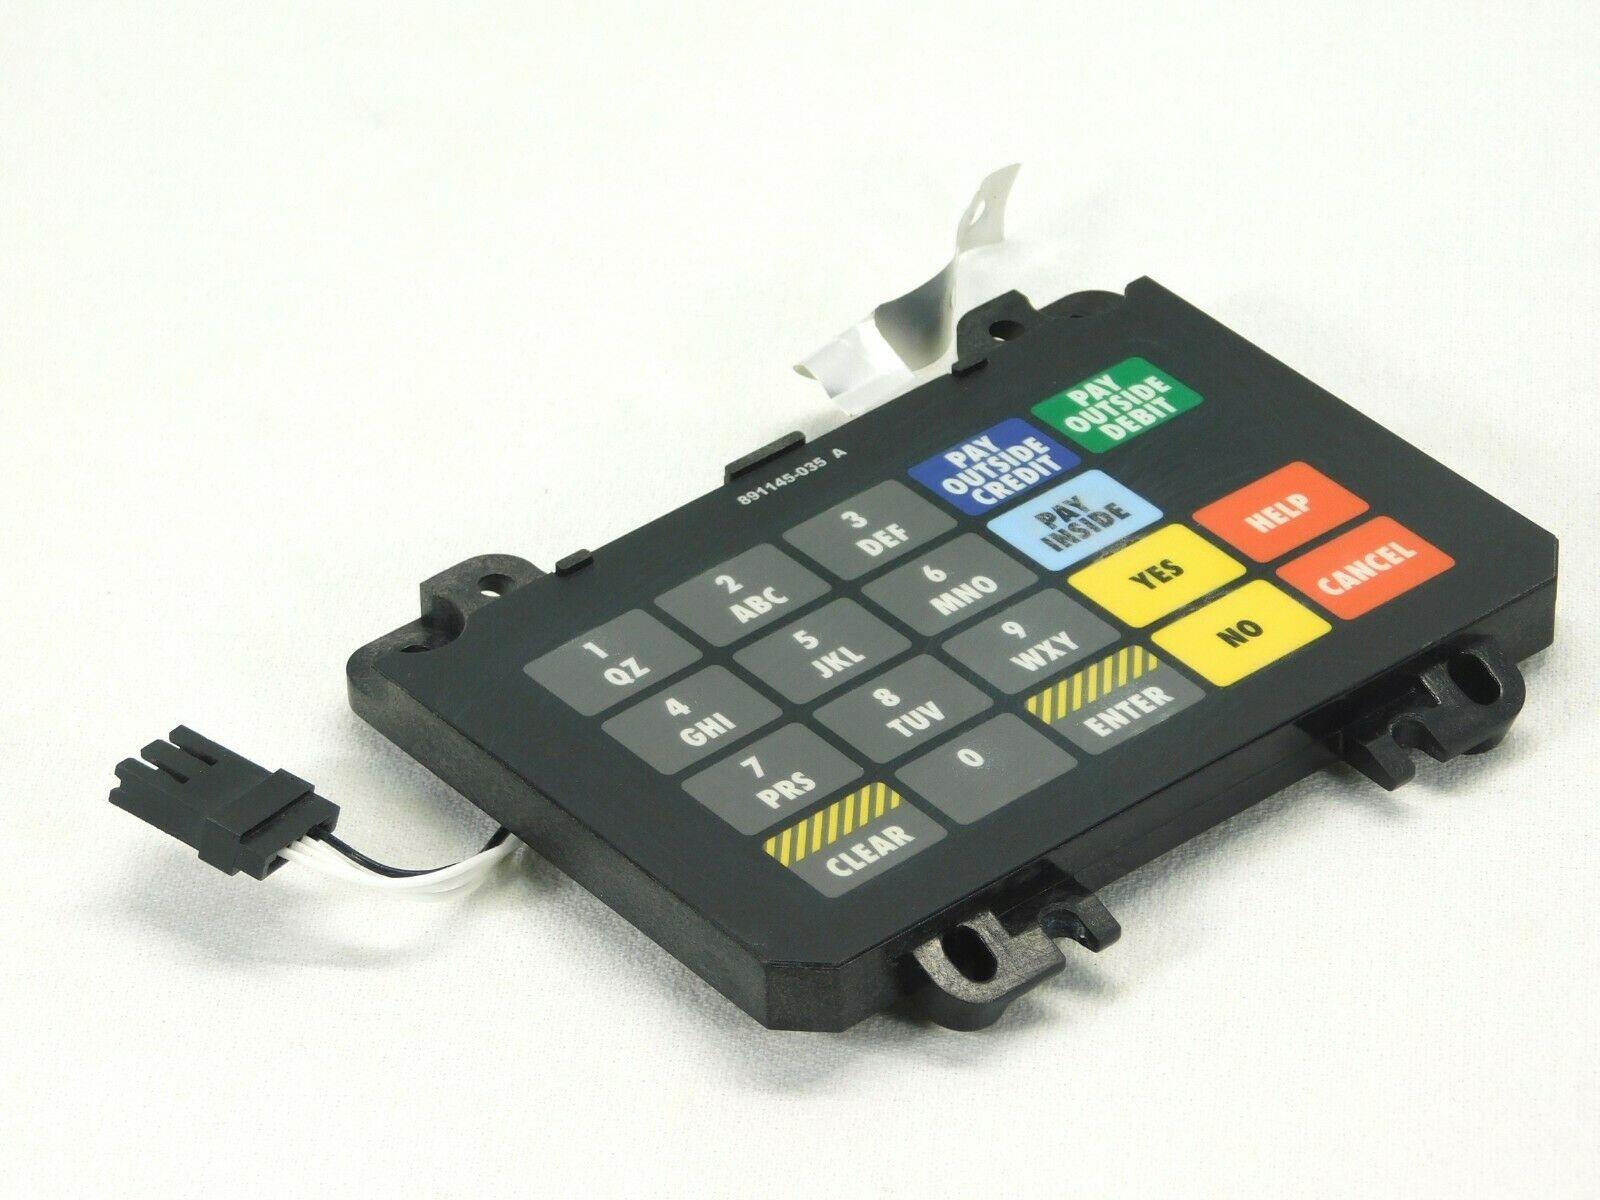 Dresser Wayne 891256 035 Ovation Keypad for Conoco Guaranteed for 1600x1200